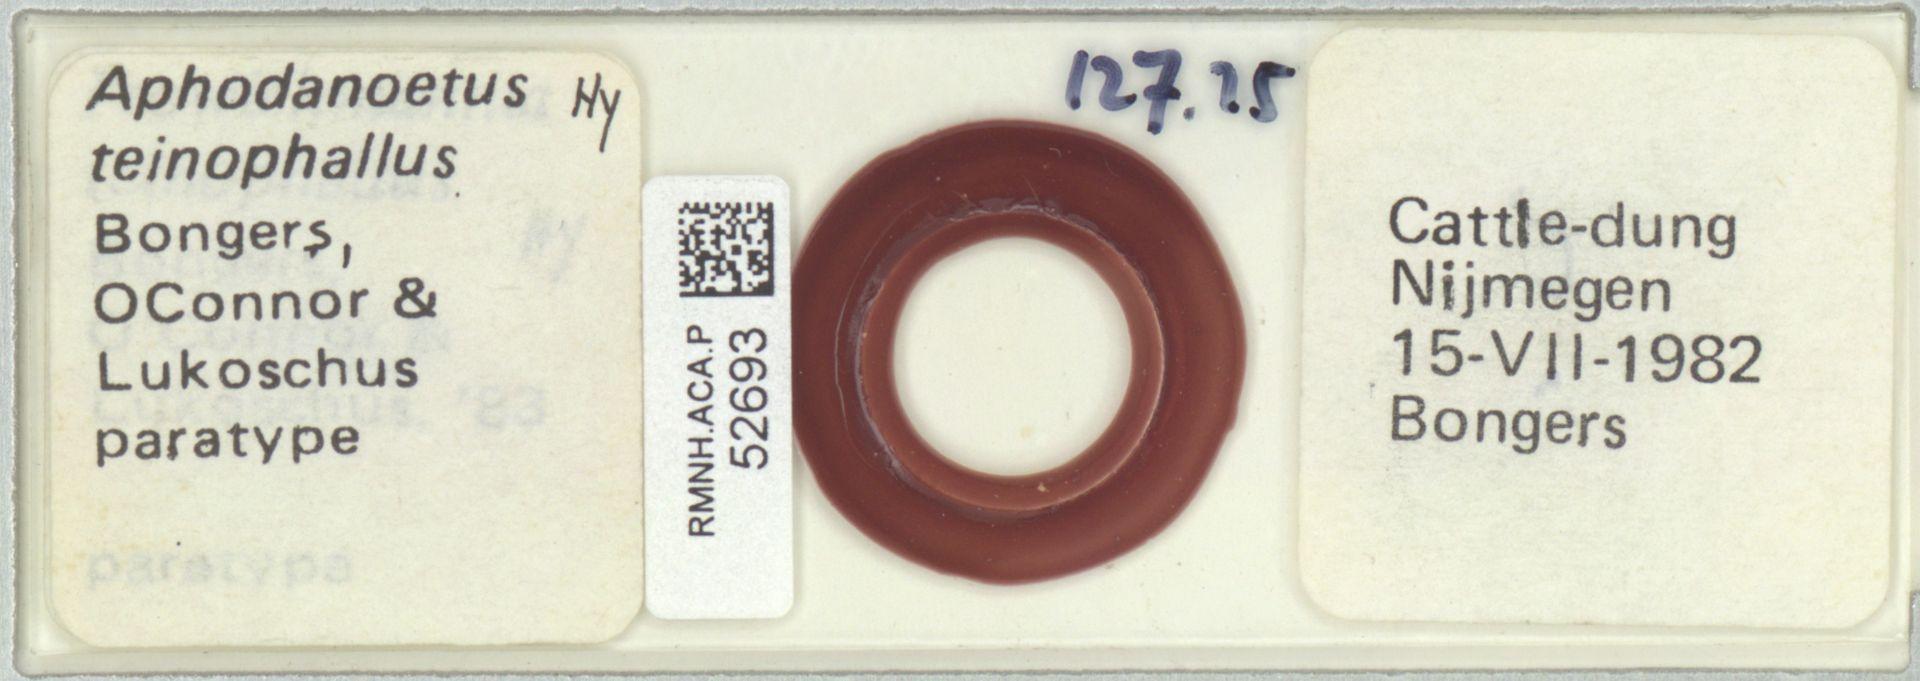 RMNH.ACA.P.52693 | Aphodanoetus teinophallus Bongers, OConnor & Lukoschus